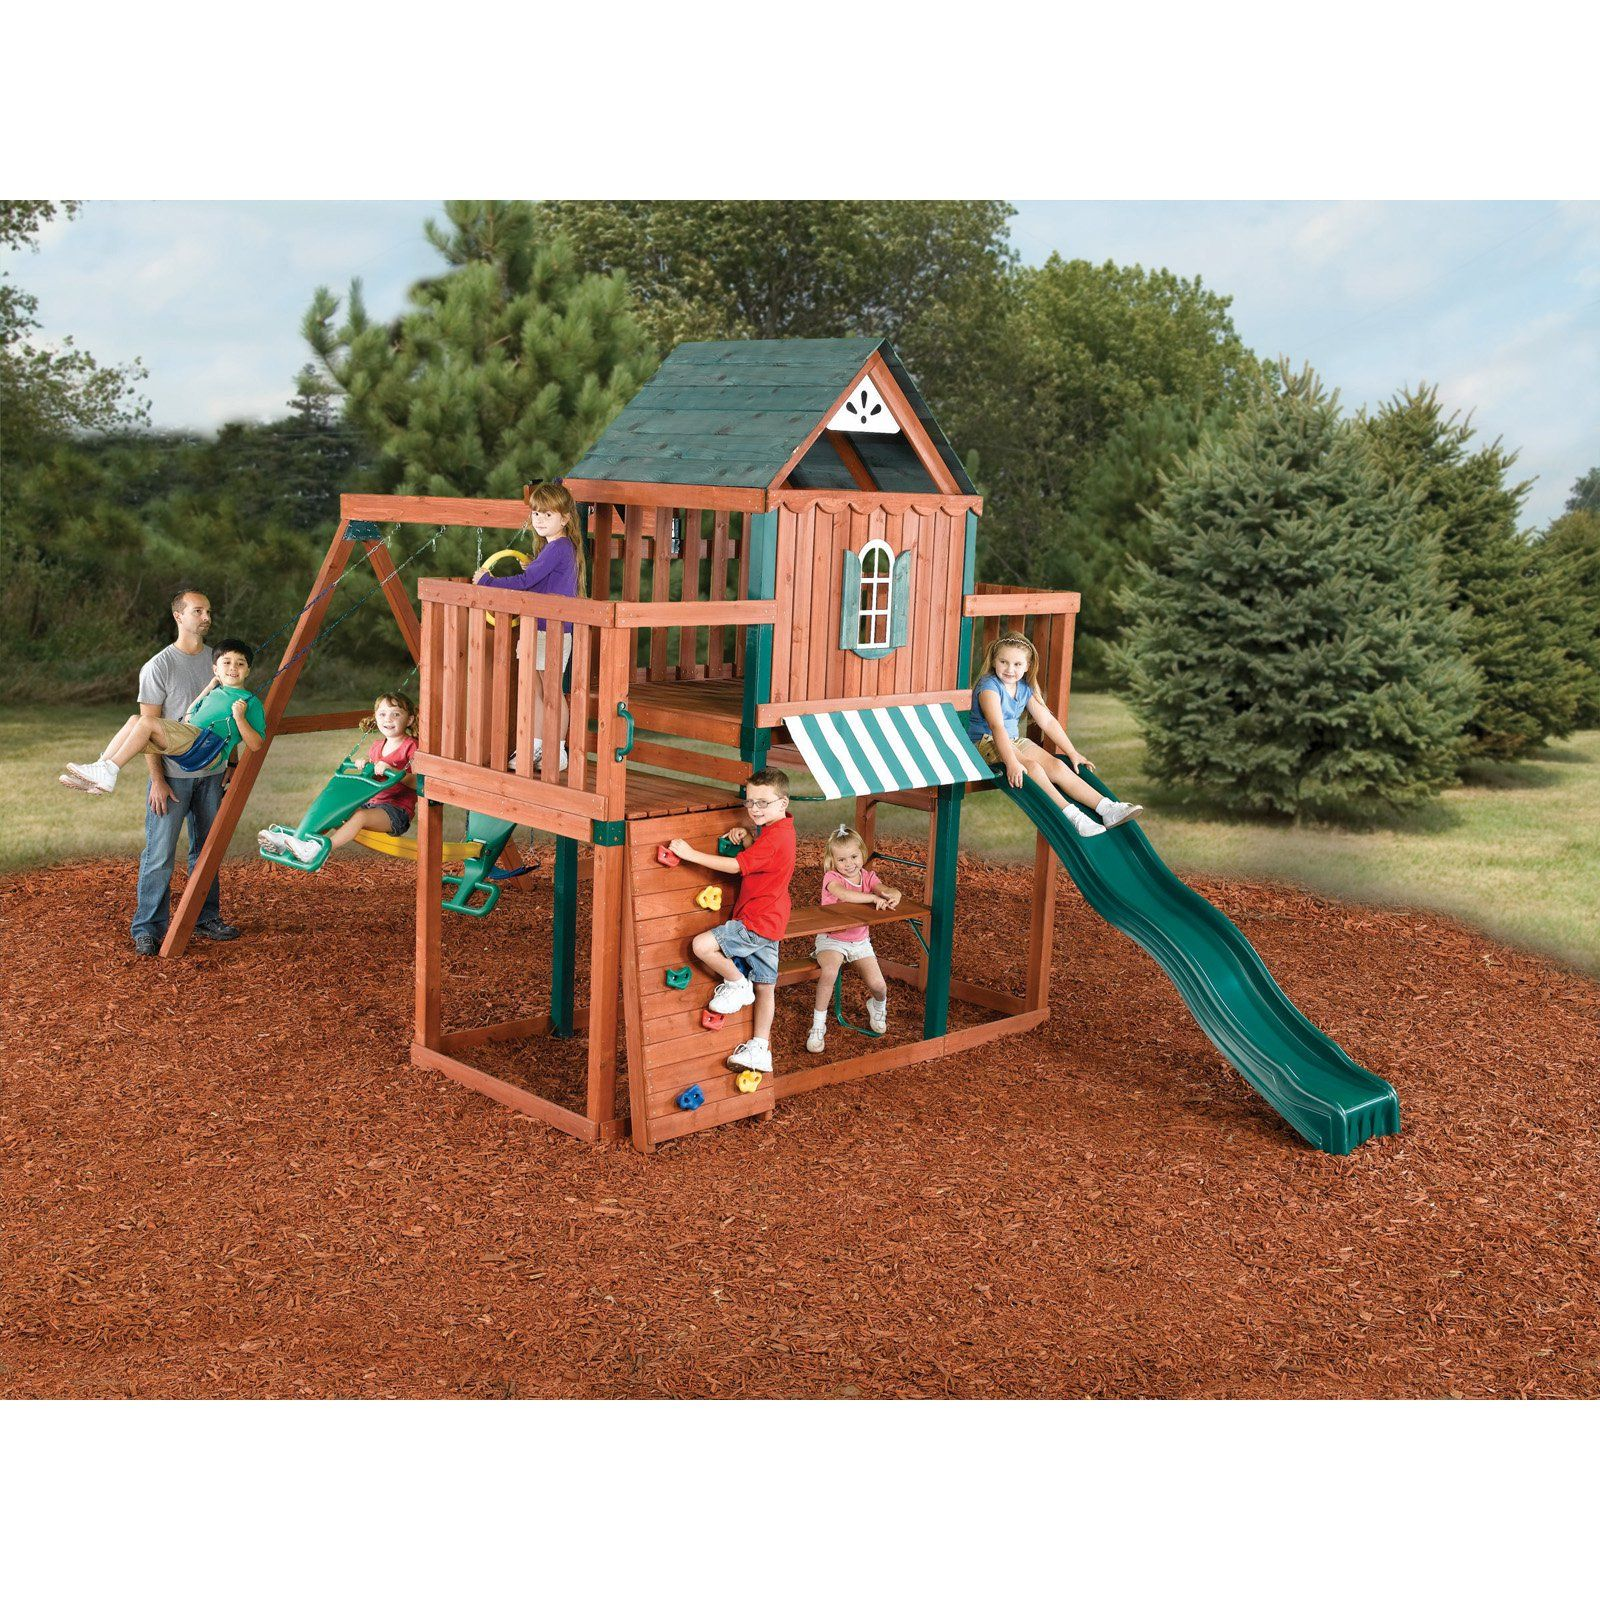 Swing-N-Slide Winchester Wood Swing Set - Build a fun ...